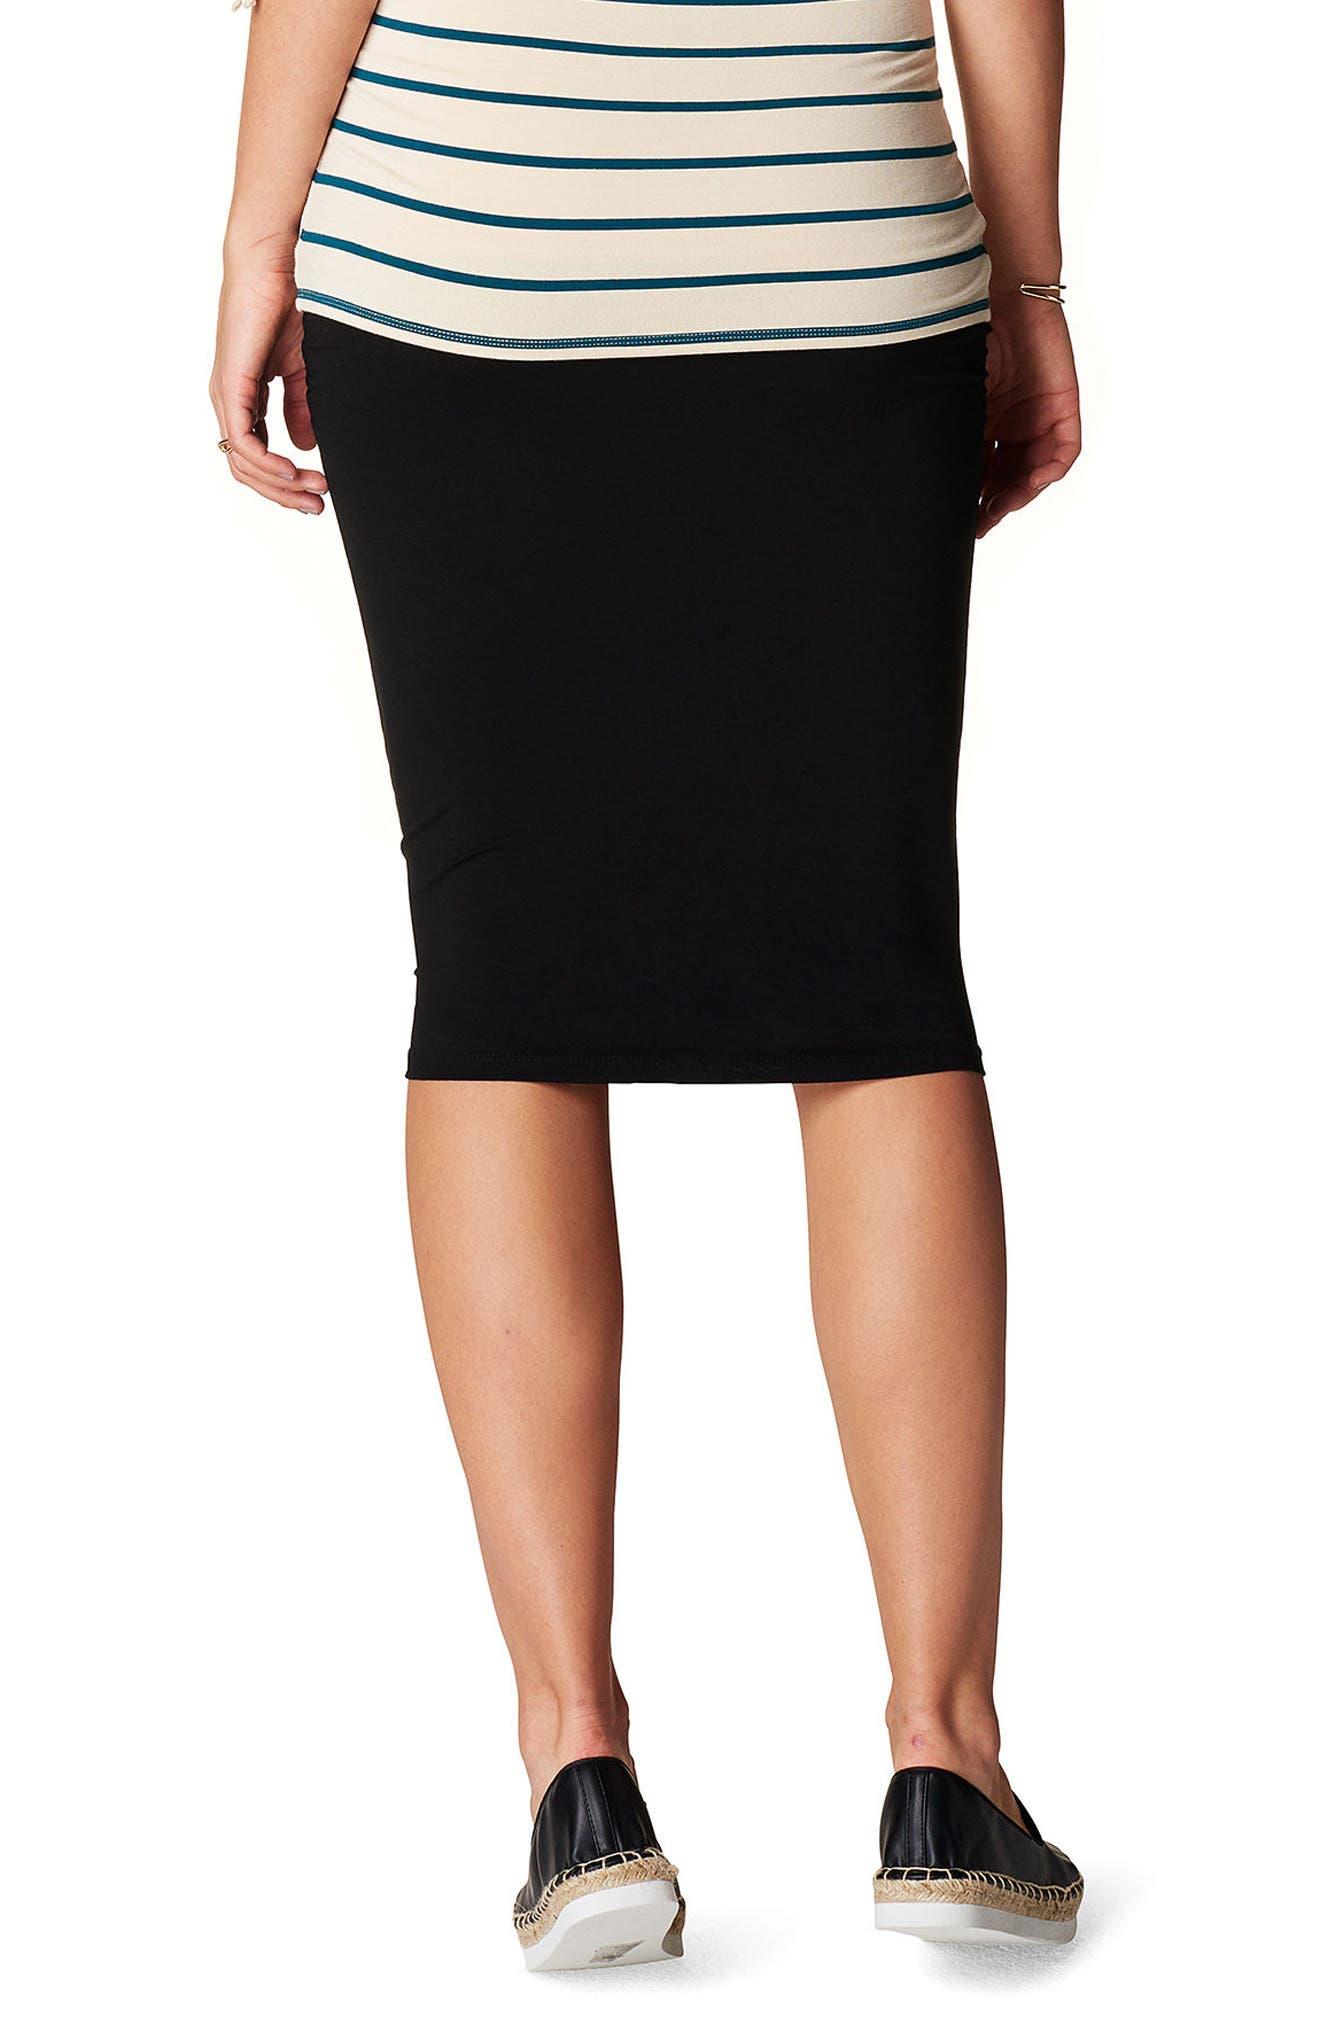 Vida Maternity Skirt,                             Alternate thumbnail 2, color,                             BLACK